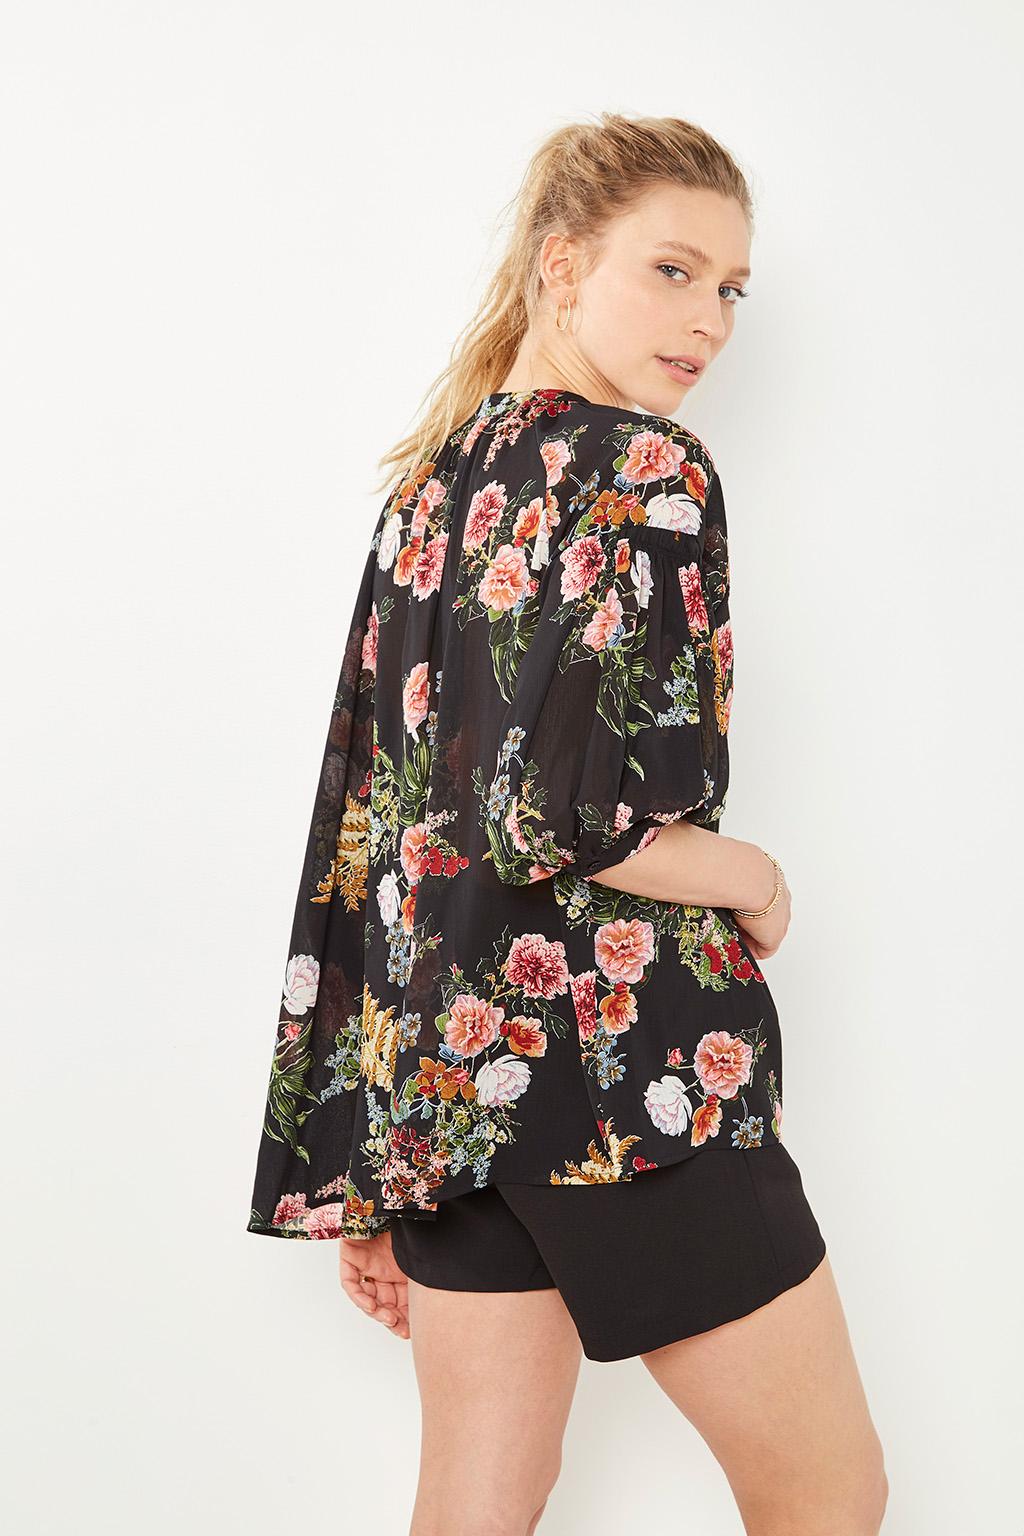 #collectionIRL chemise fleuris